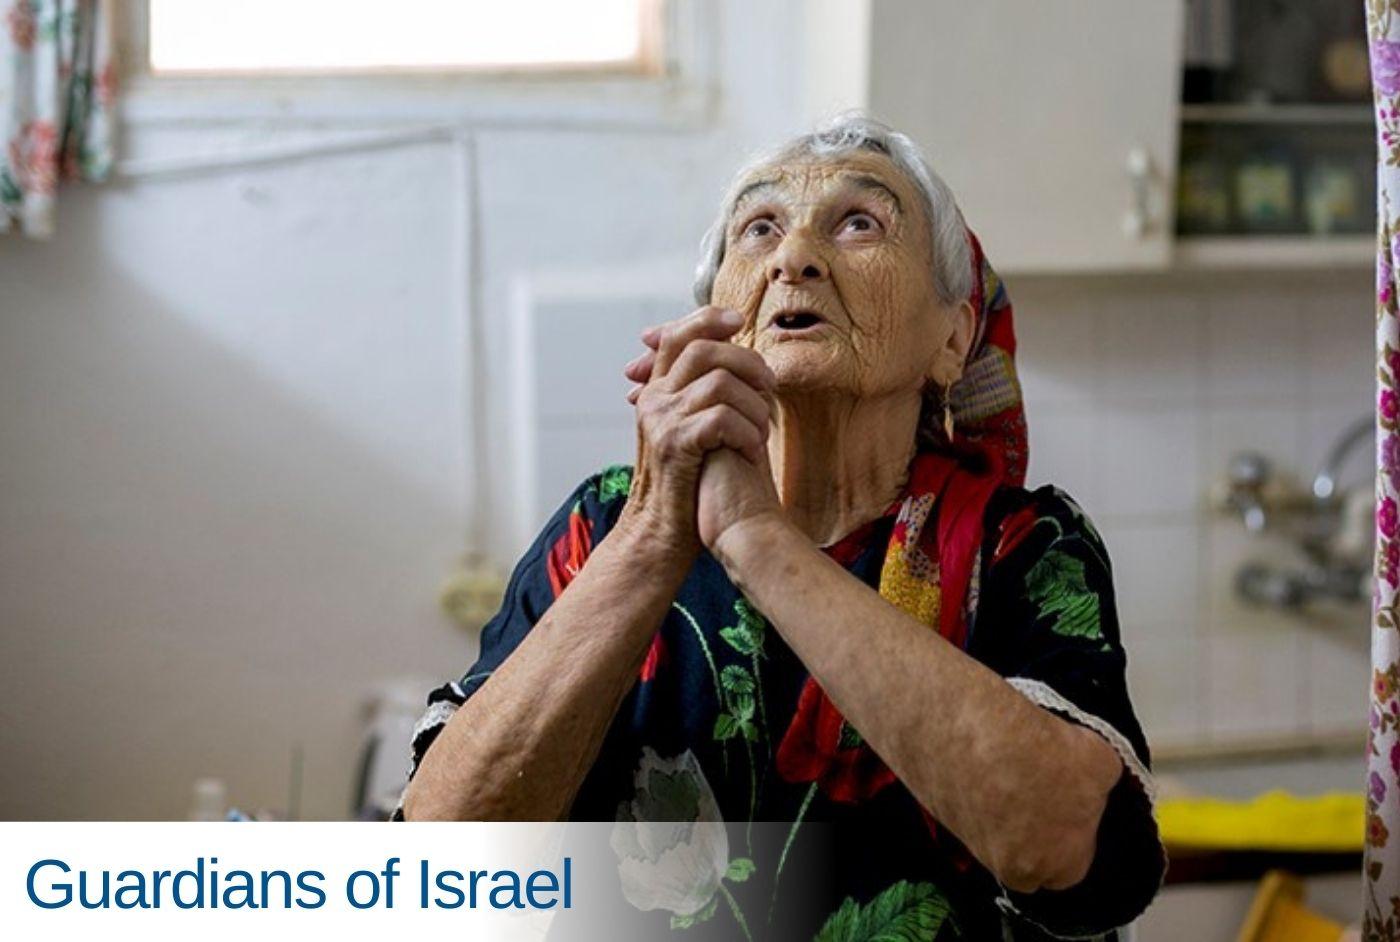 Guardians of Israel